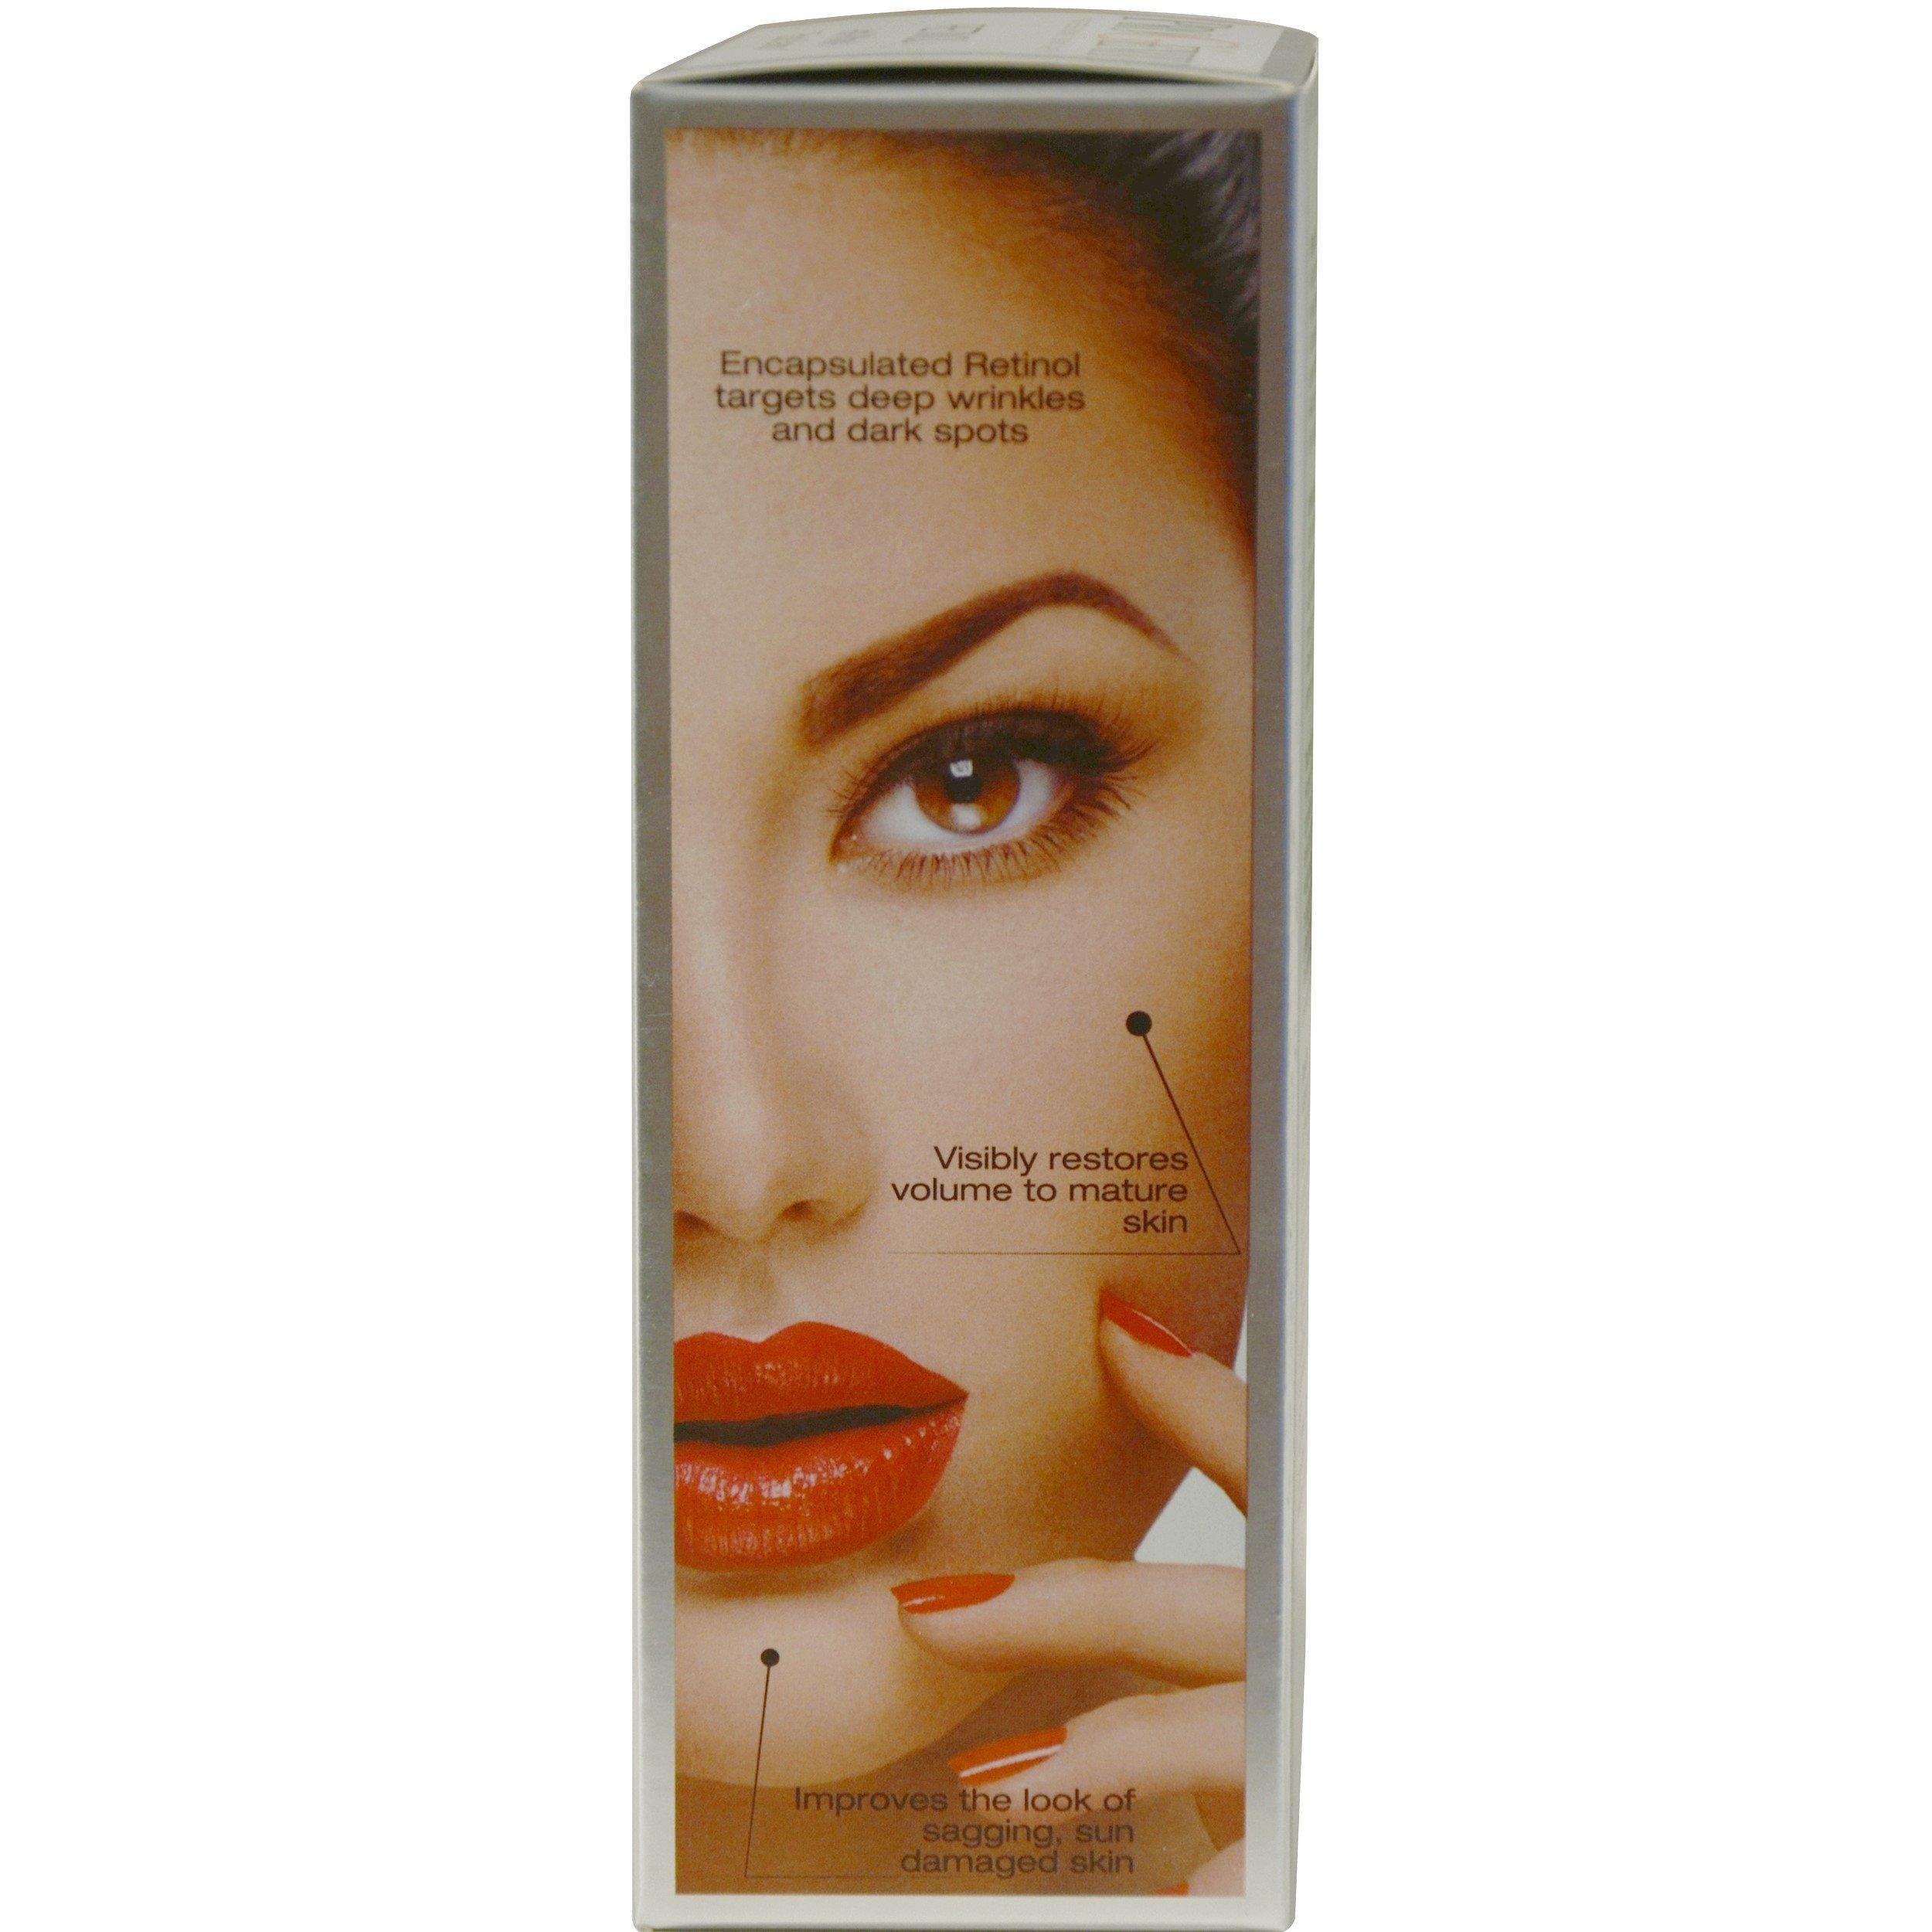 Progenix Professional Skin Care Retinol Serum. Anti-Wrinkle Face serum targets deep wrinkles and dark spots. 1oz